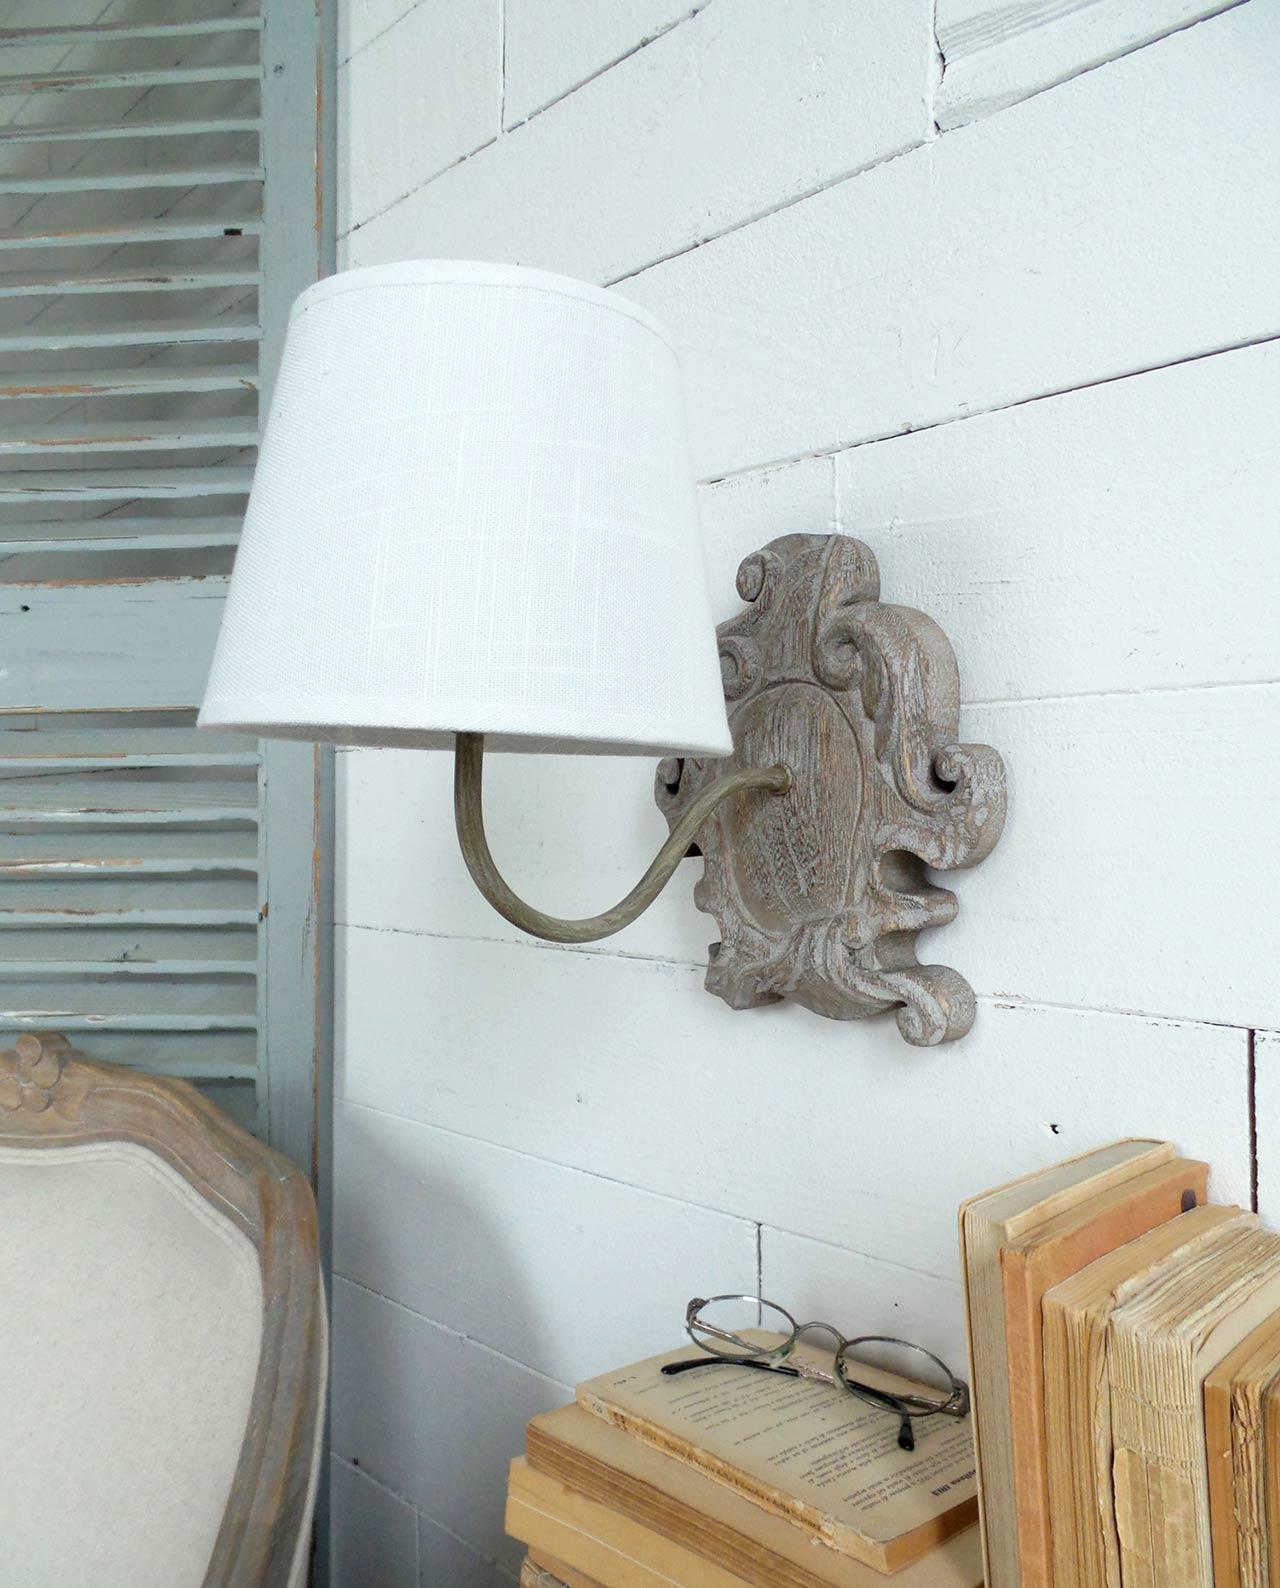 applique da parete legno con bordi irregolari mobiliastore. Black Bedroom Furniture Sets. Home Design Ideas